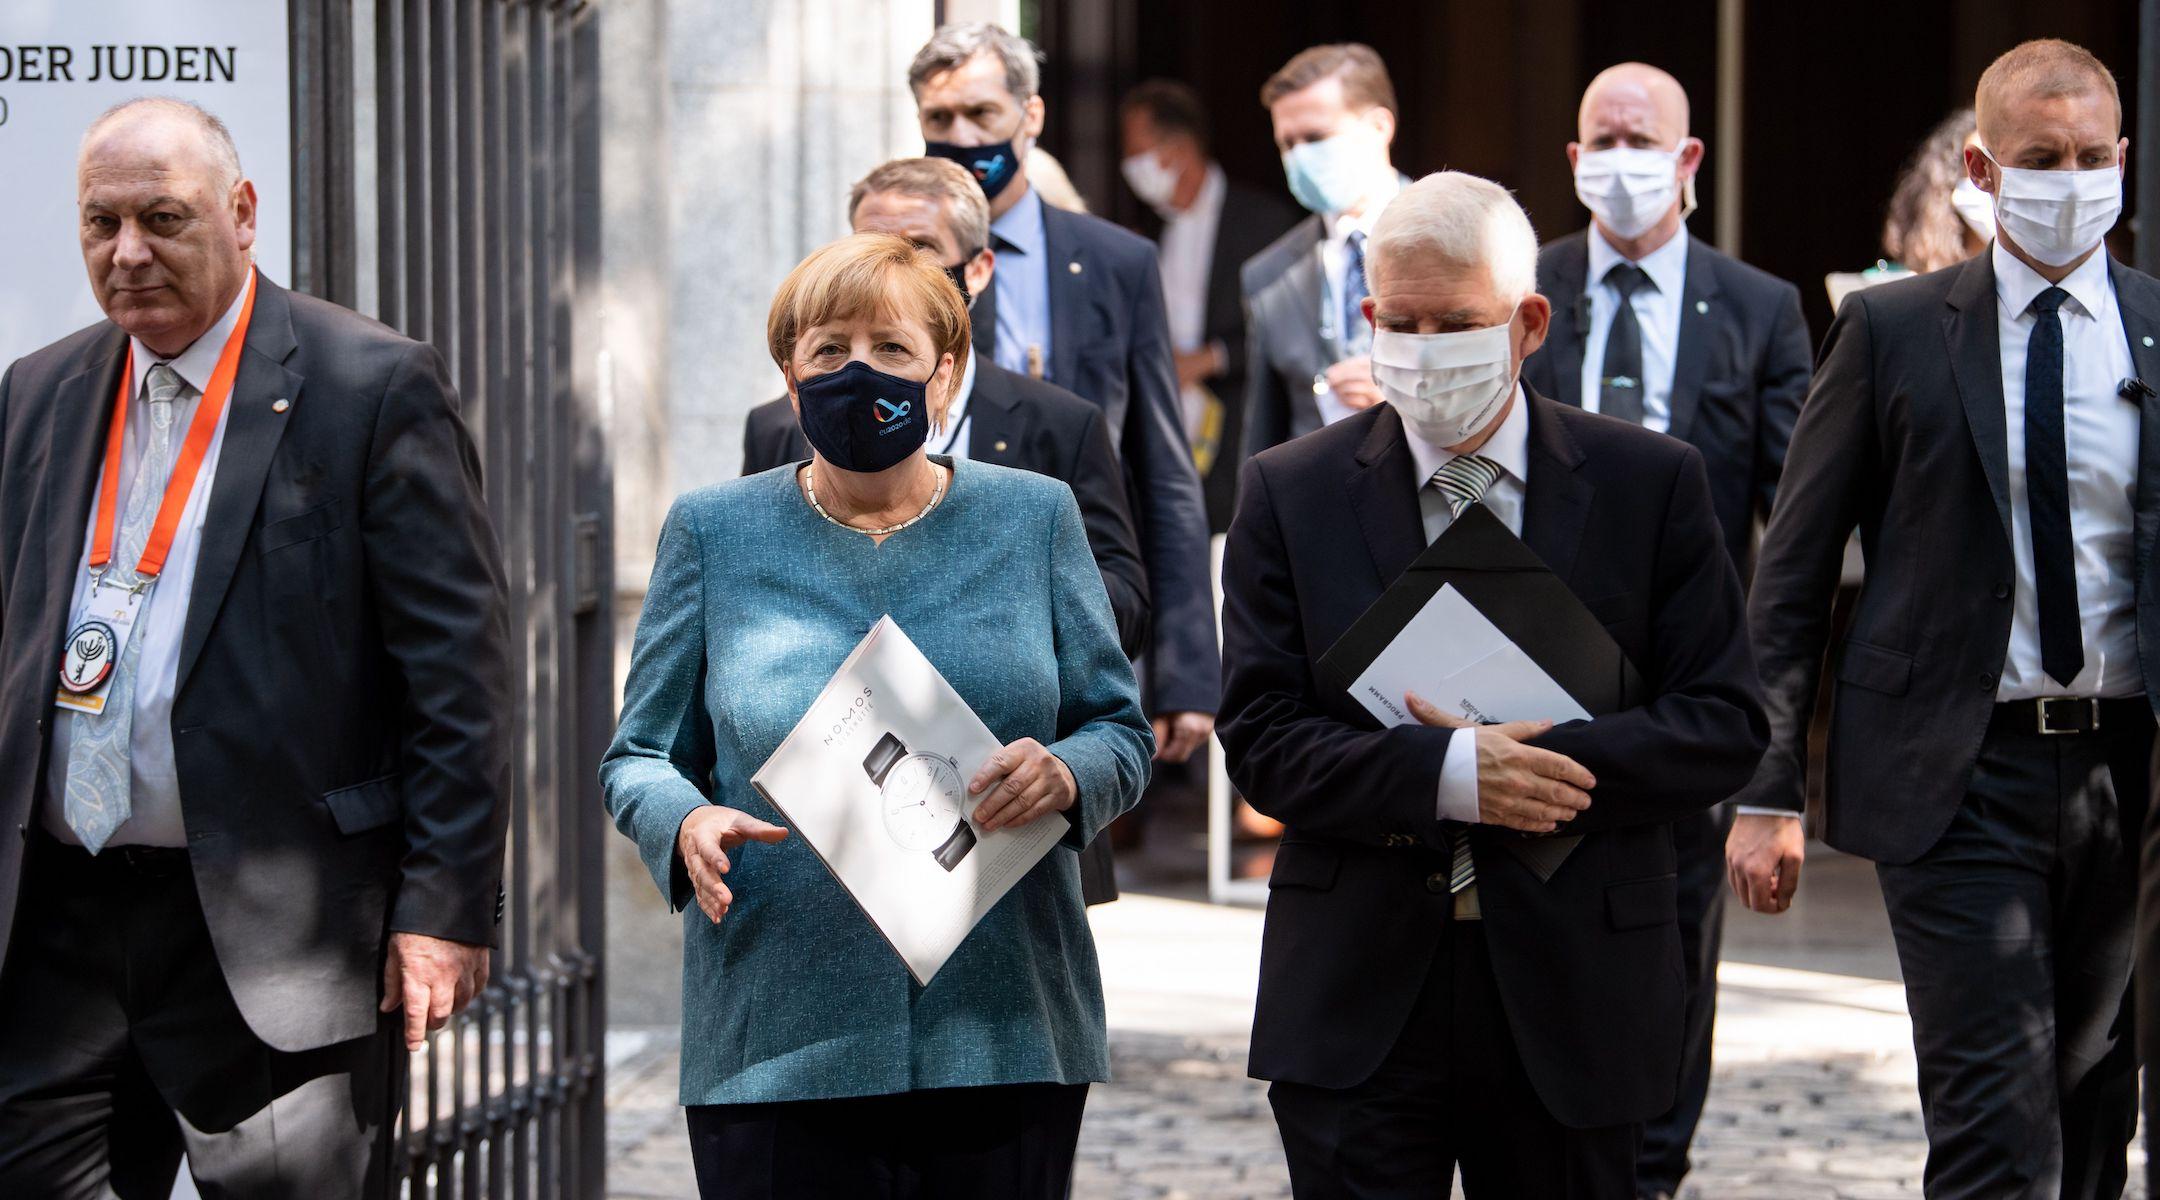 Germany pledges extra $26 million for Jewish security